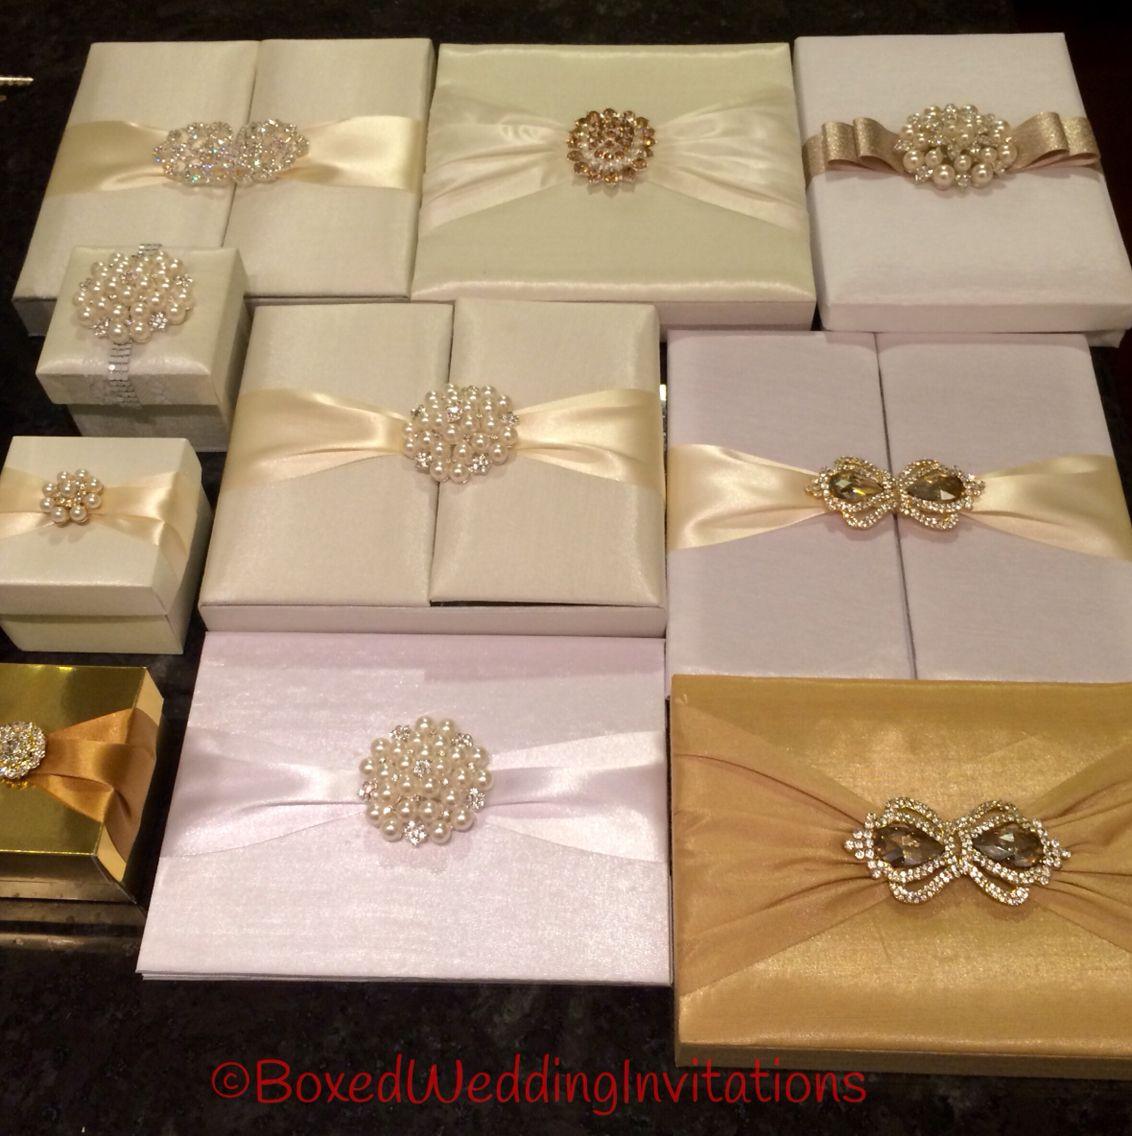 Beautiful wedding invitation boxes in white Ivory